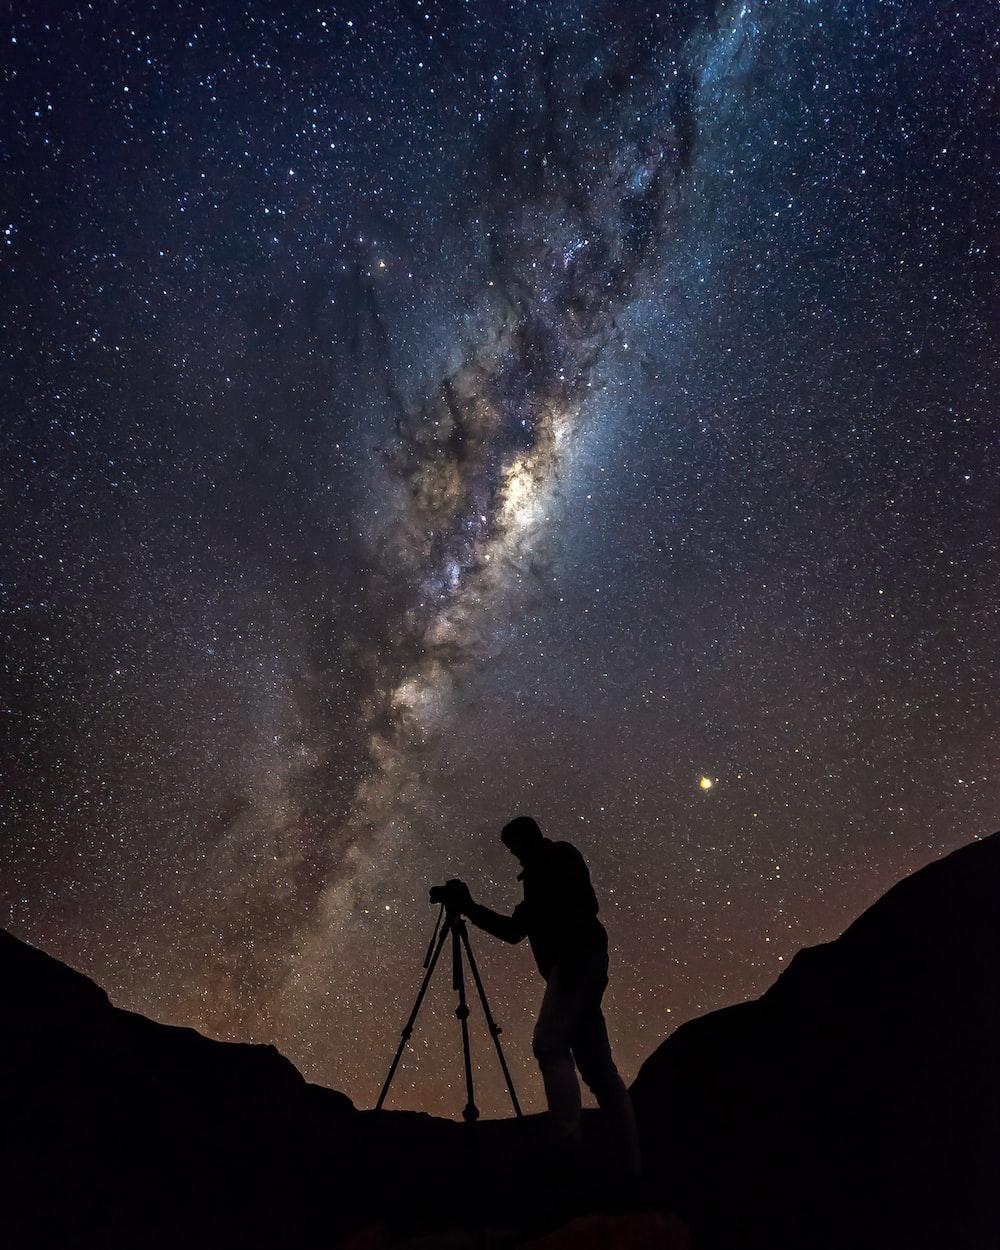 silhouette photo of man under Aurora phenomenon